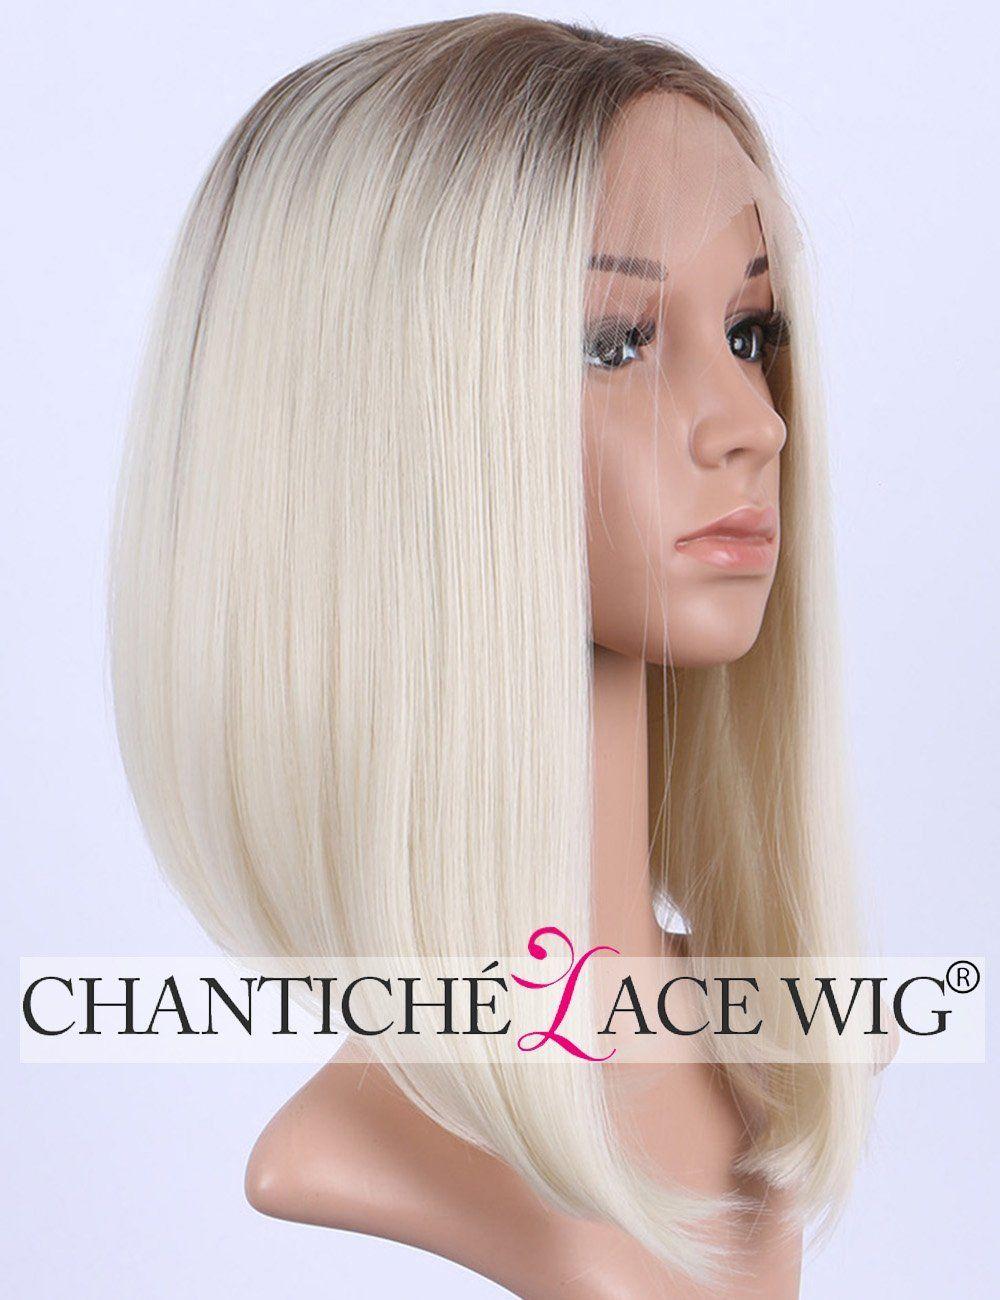 Chantiche Hot Sale Natural Looking Platinum Blonde Short Bob Hair Lace Wigs Fashion Brown Roots Synthetic Lace Fro Long Hair Wigs Lace Wigs Synthetic Lace Wigs